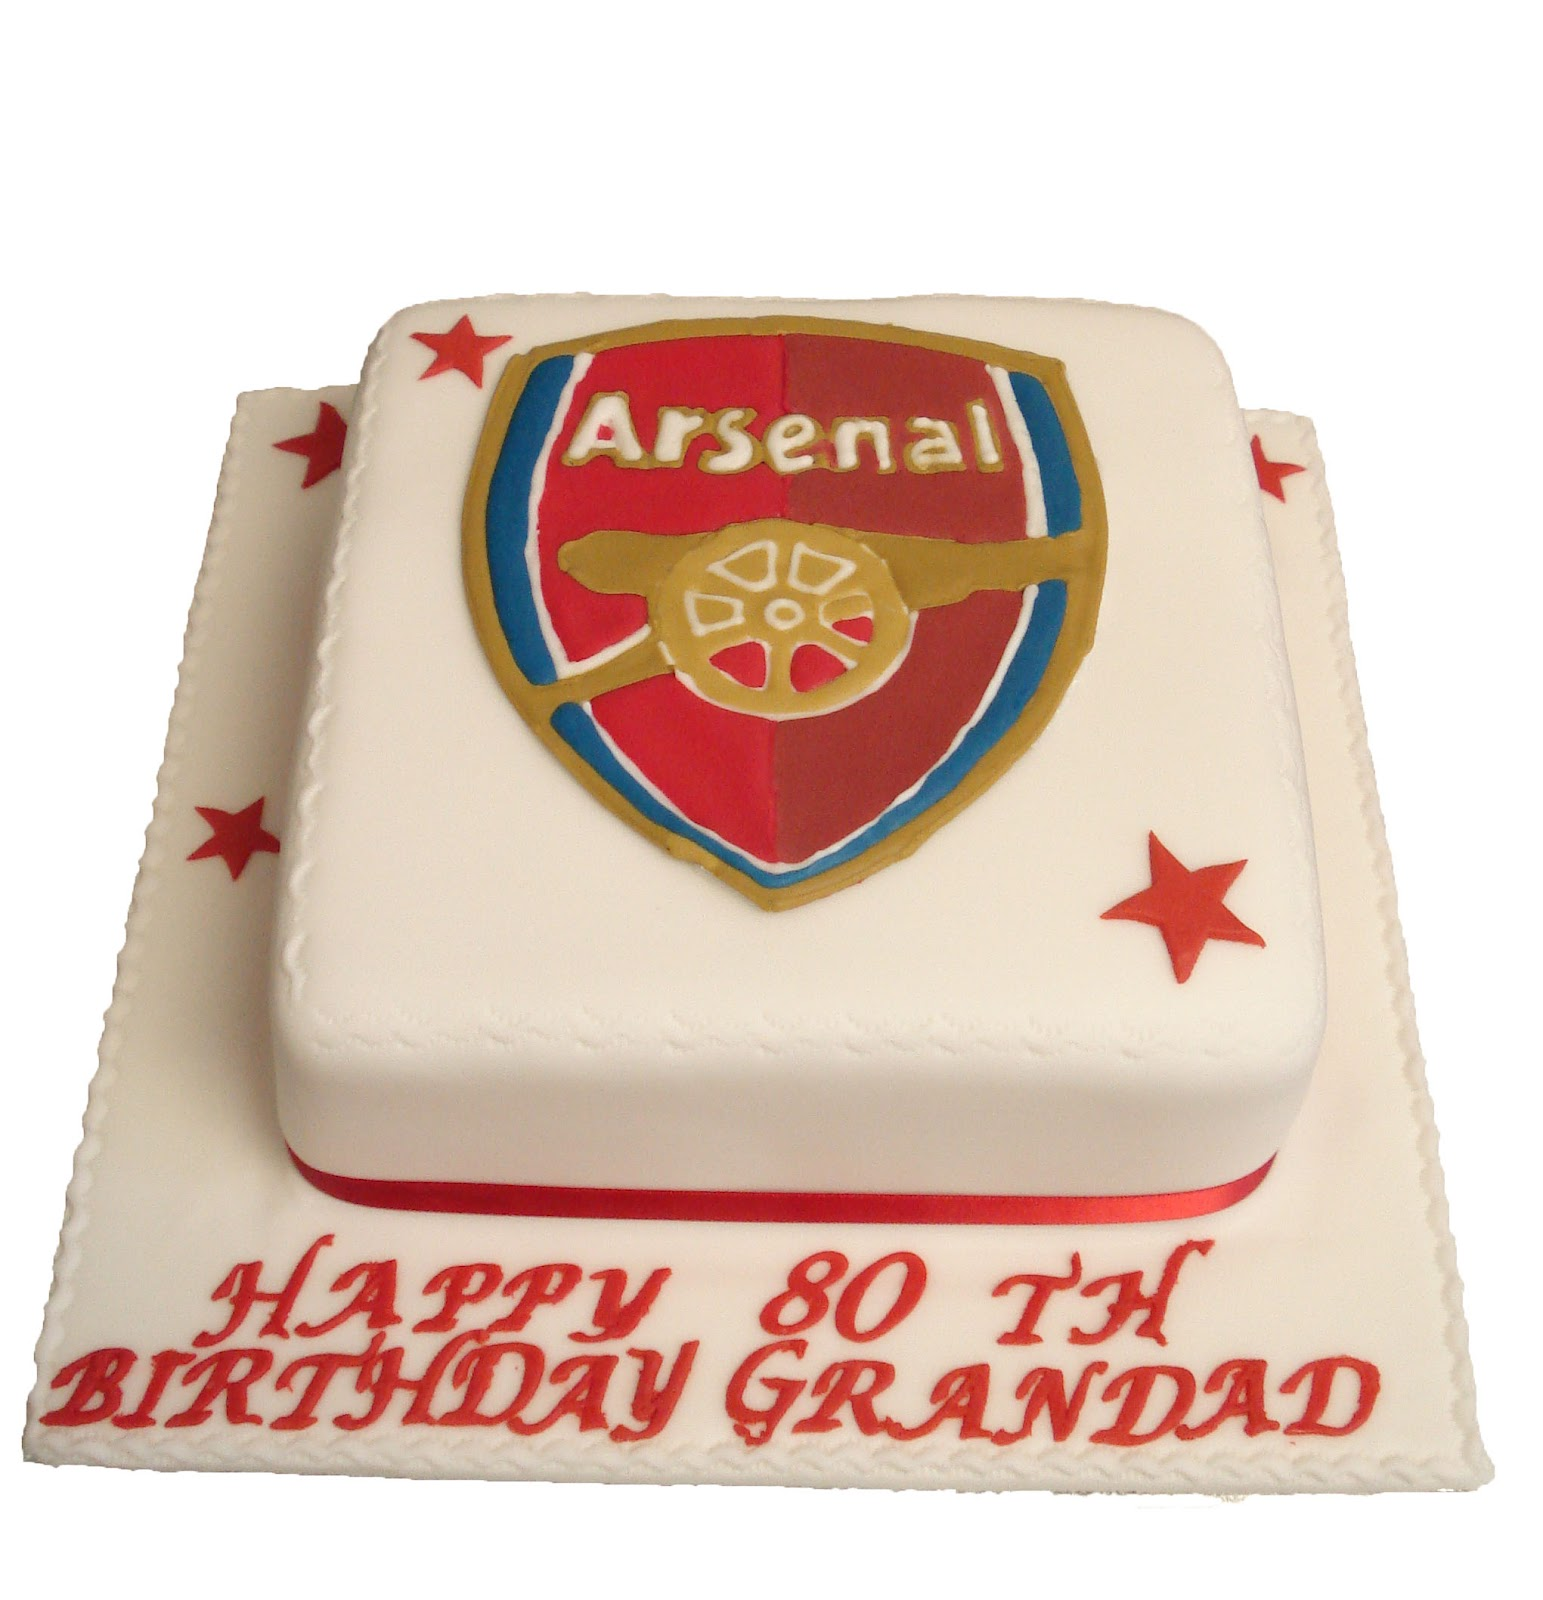 Asda Christening Cake Decorations : Brigitta s Cakes: Arsenal Cake